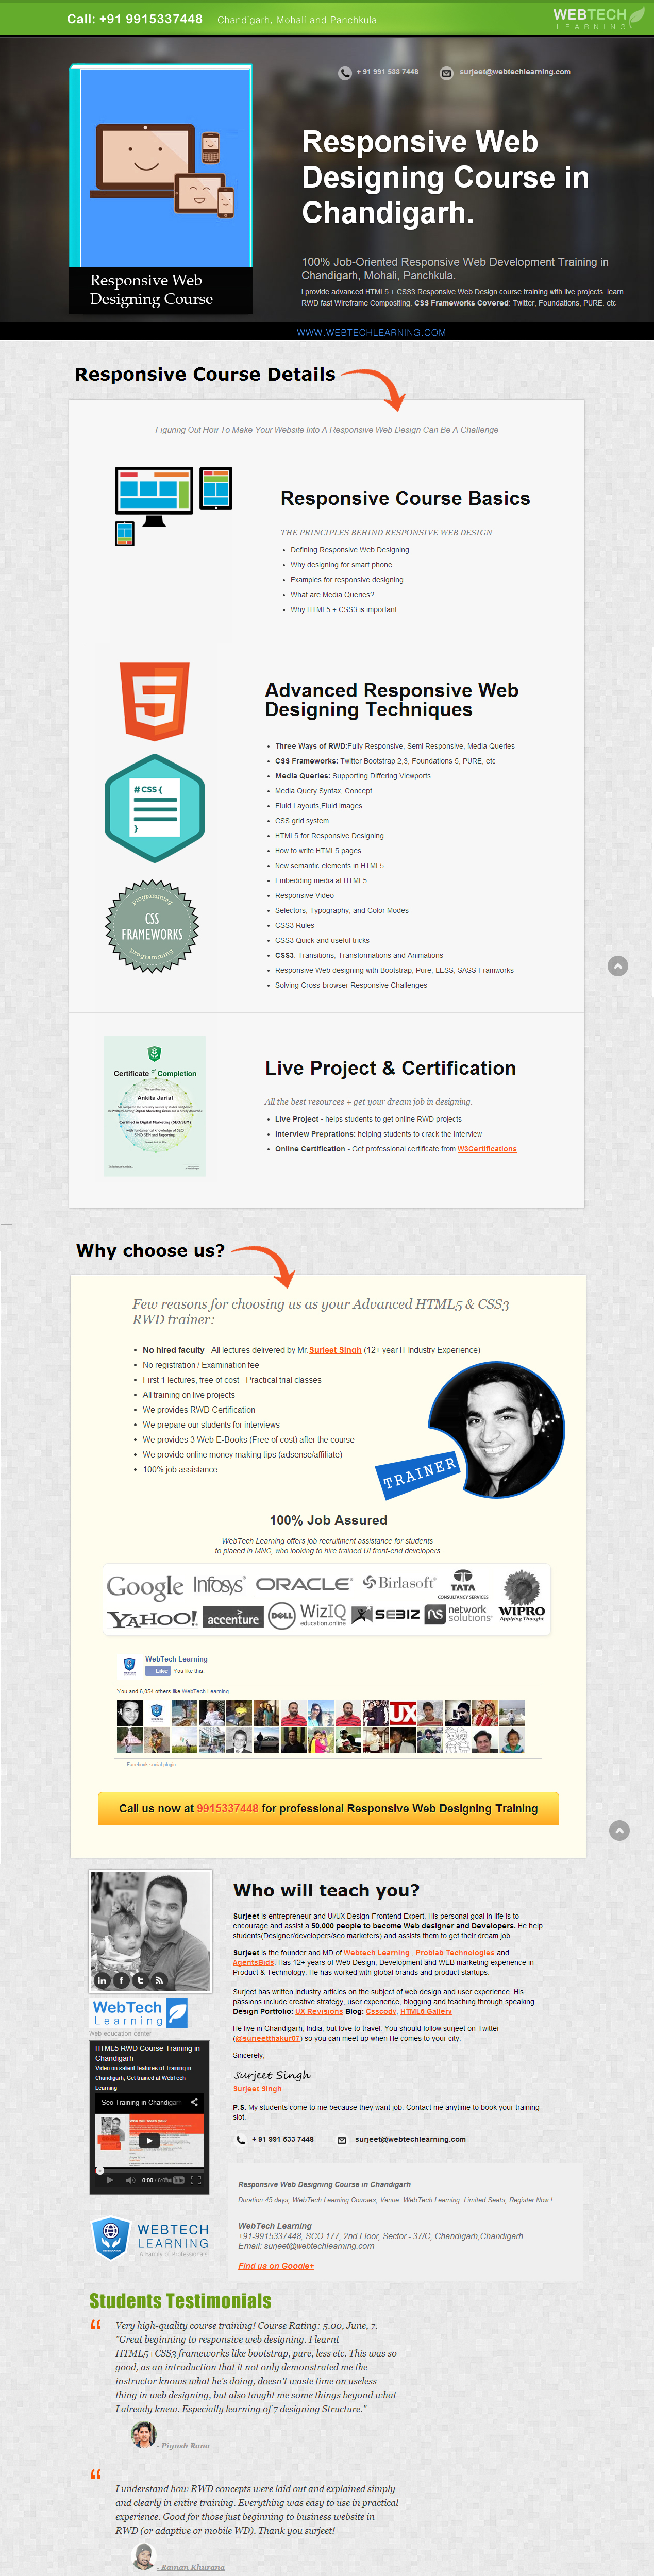 Responsive Web Designing Course Syllabus Http Webtechlearning Com Web Design Course Fun Website Design Web Design